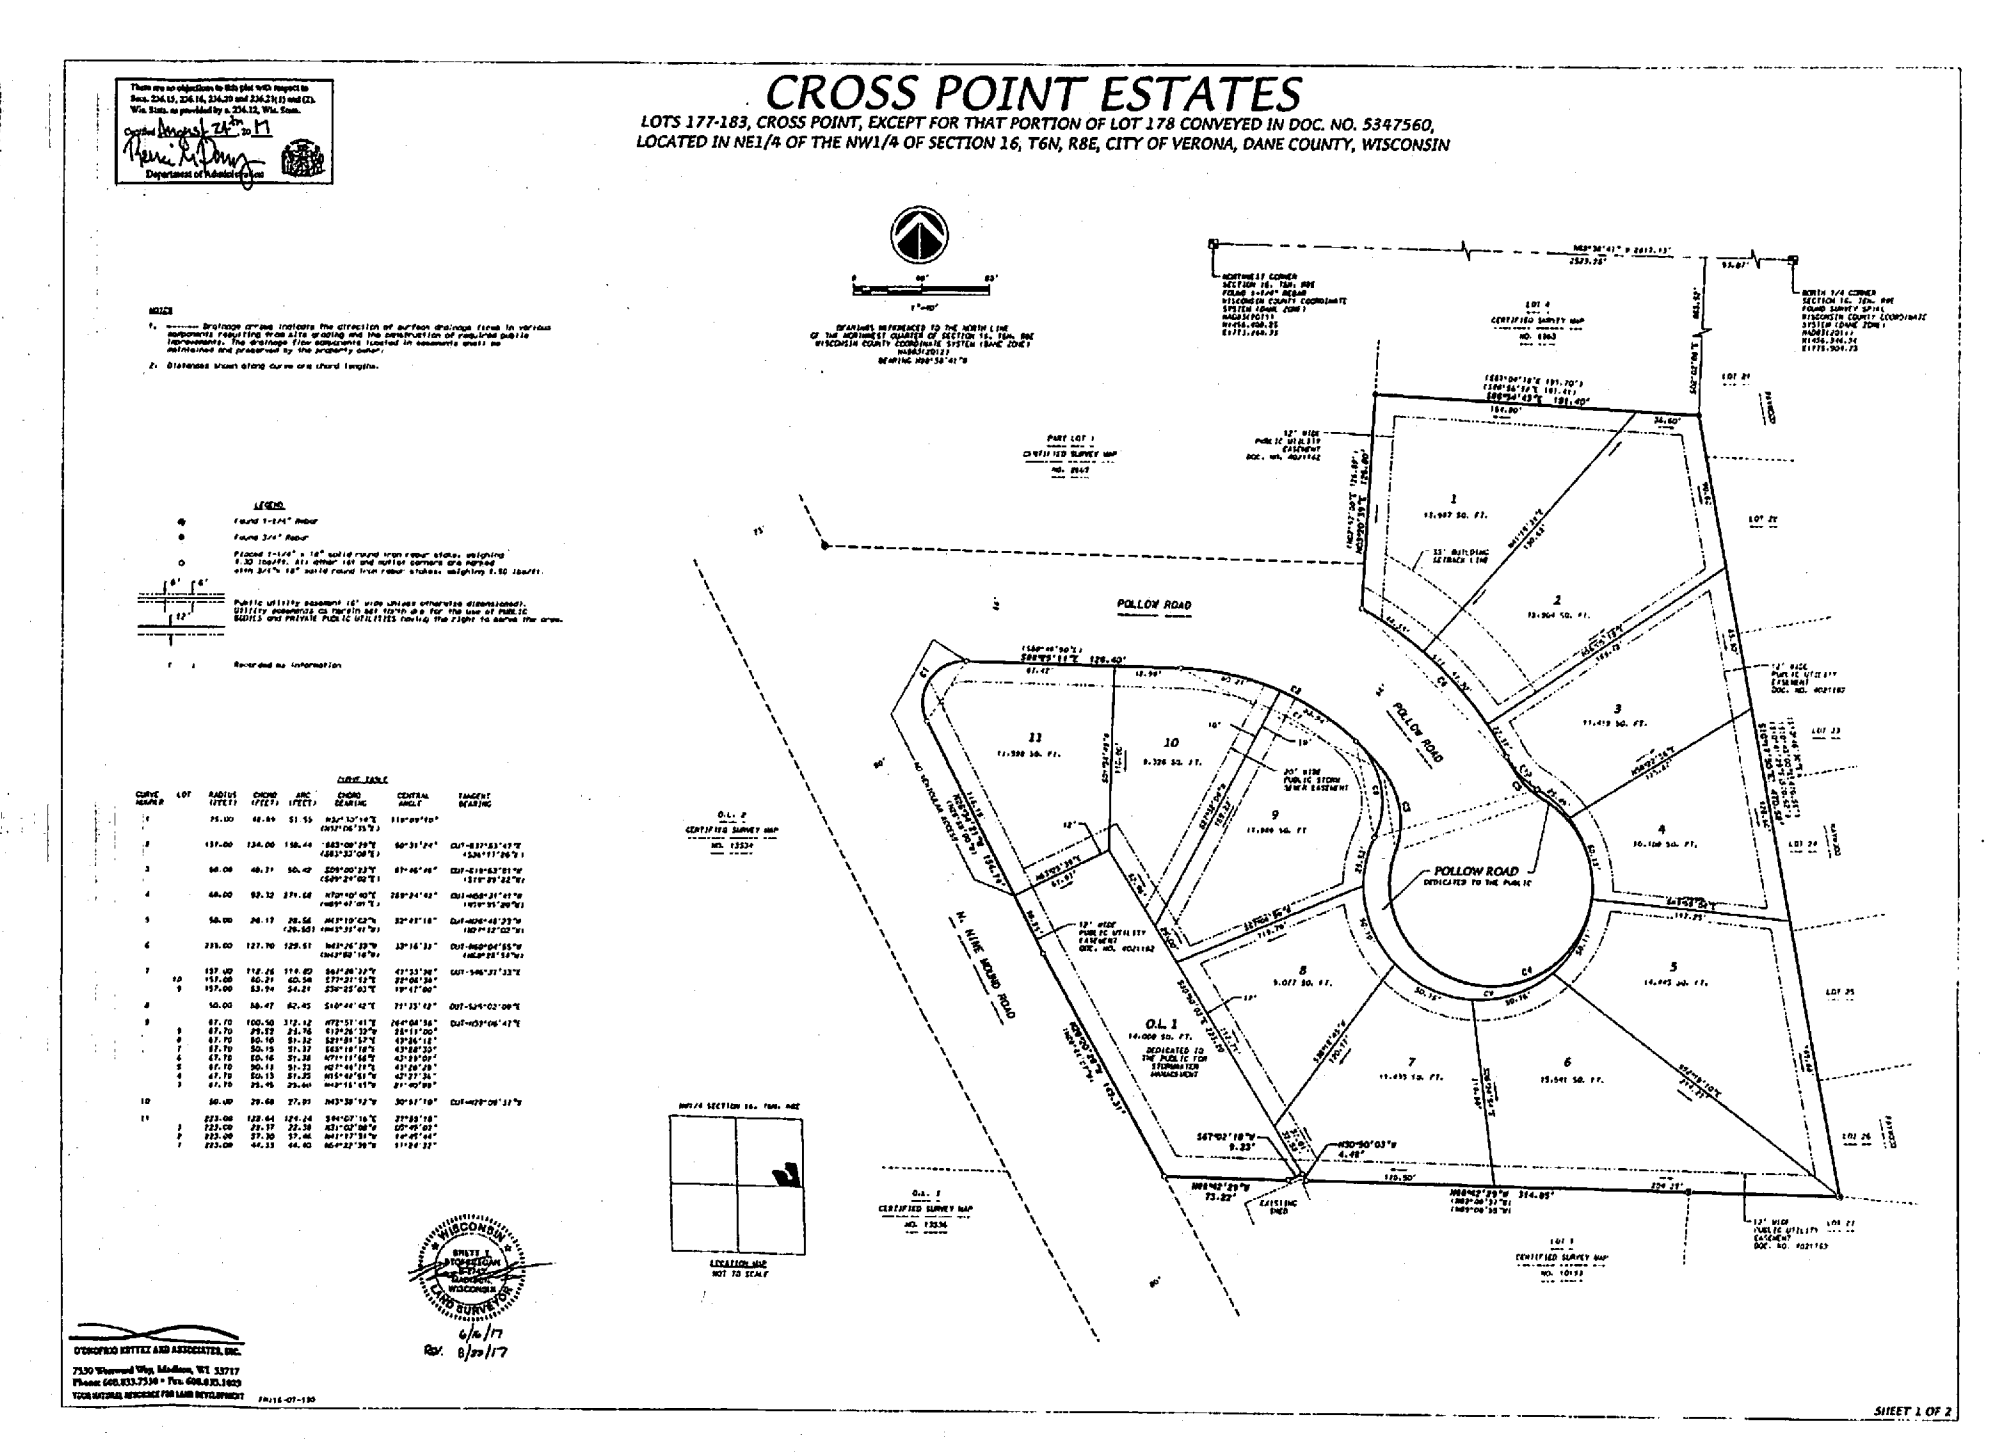 Cross Point Estates - Acker Builders Waunakee